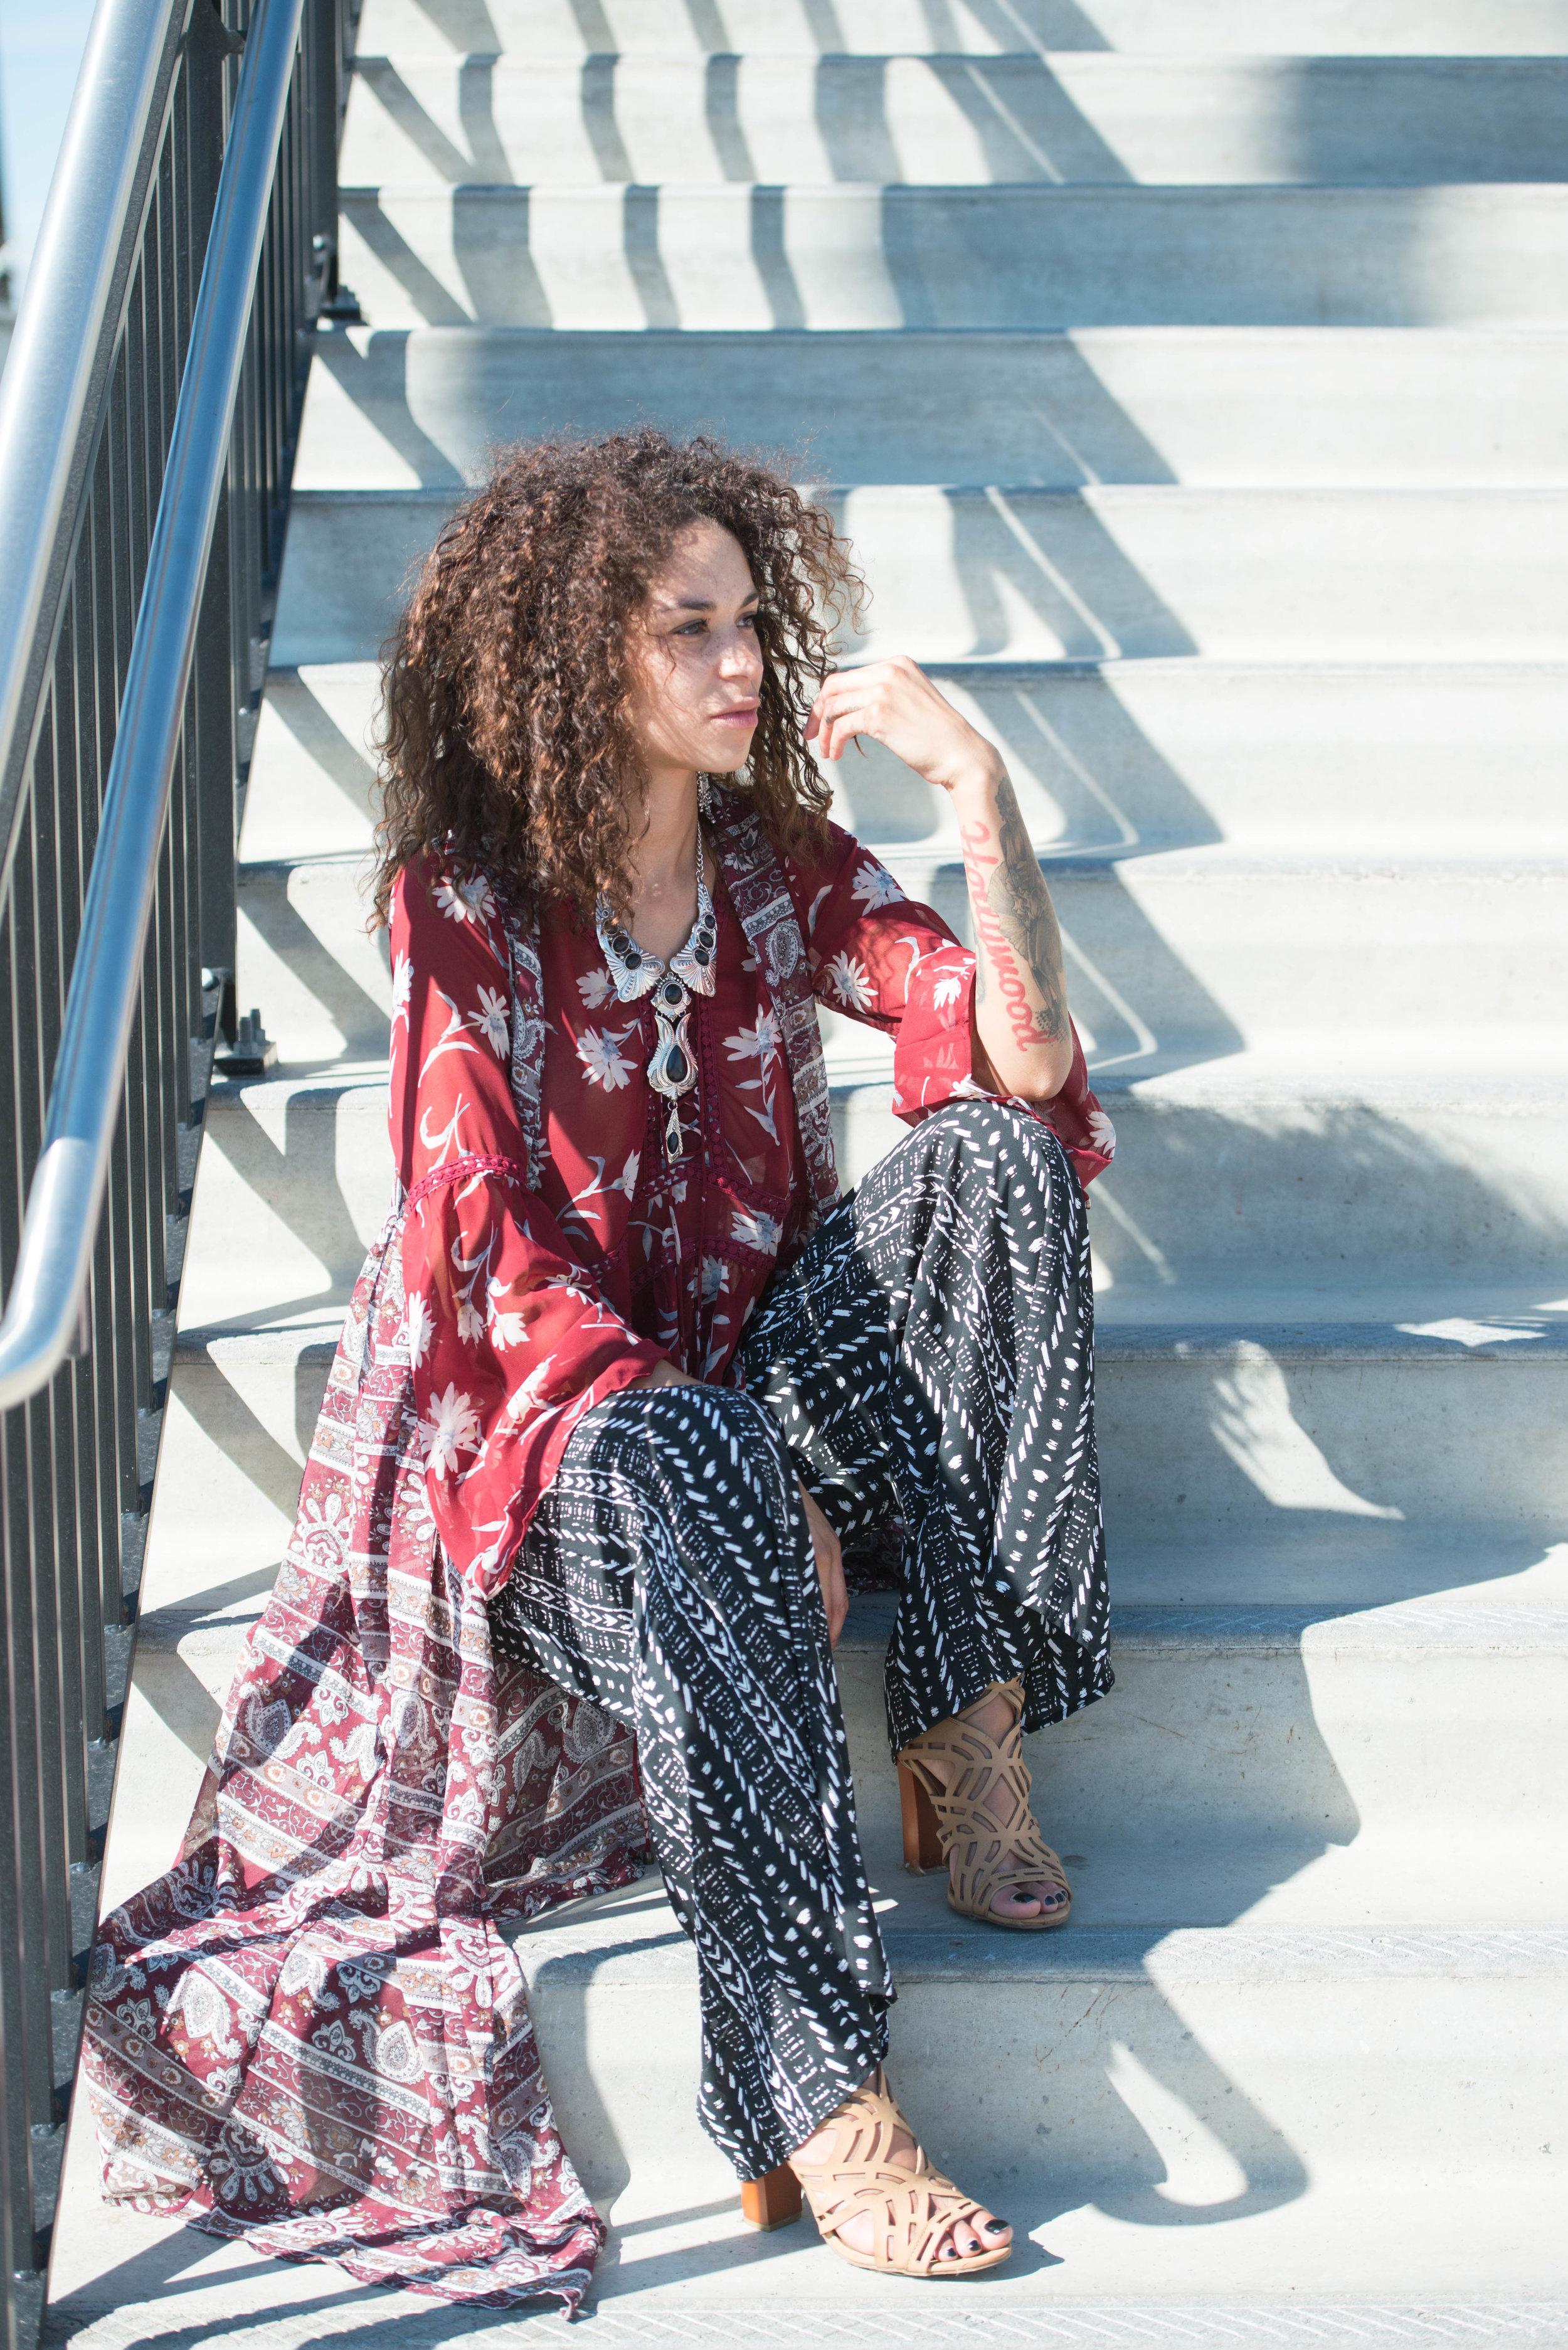 Photo by  Kimothy Joy  for DSM Issue No. 6